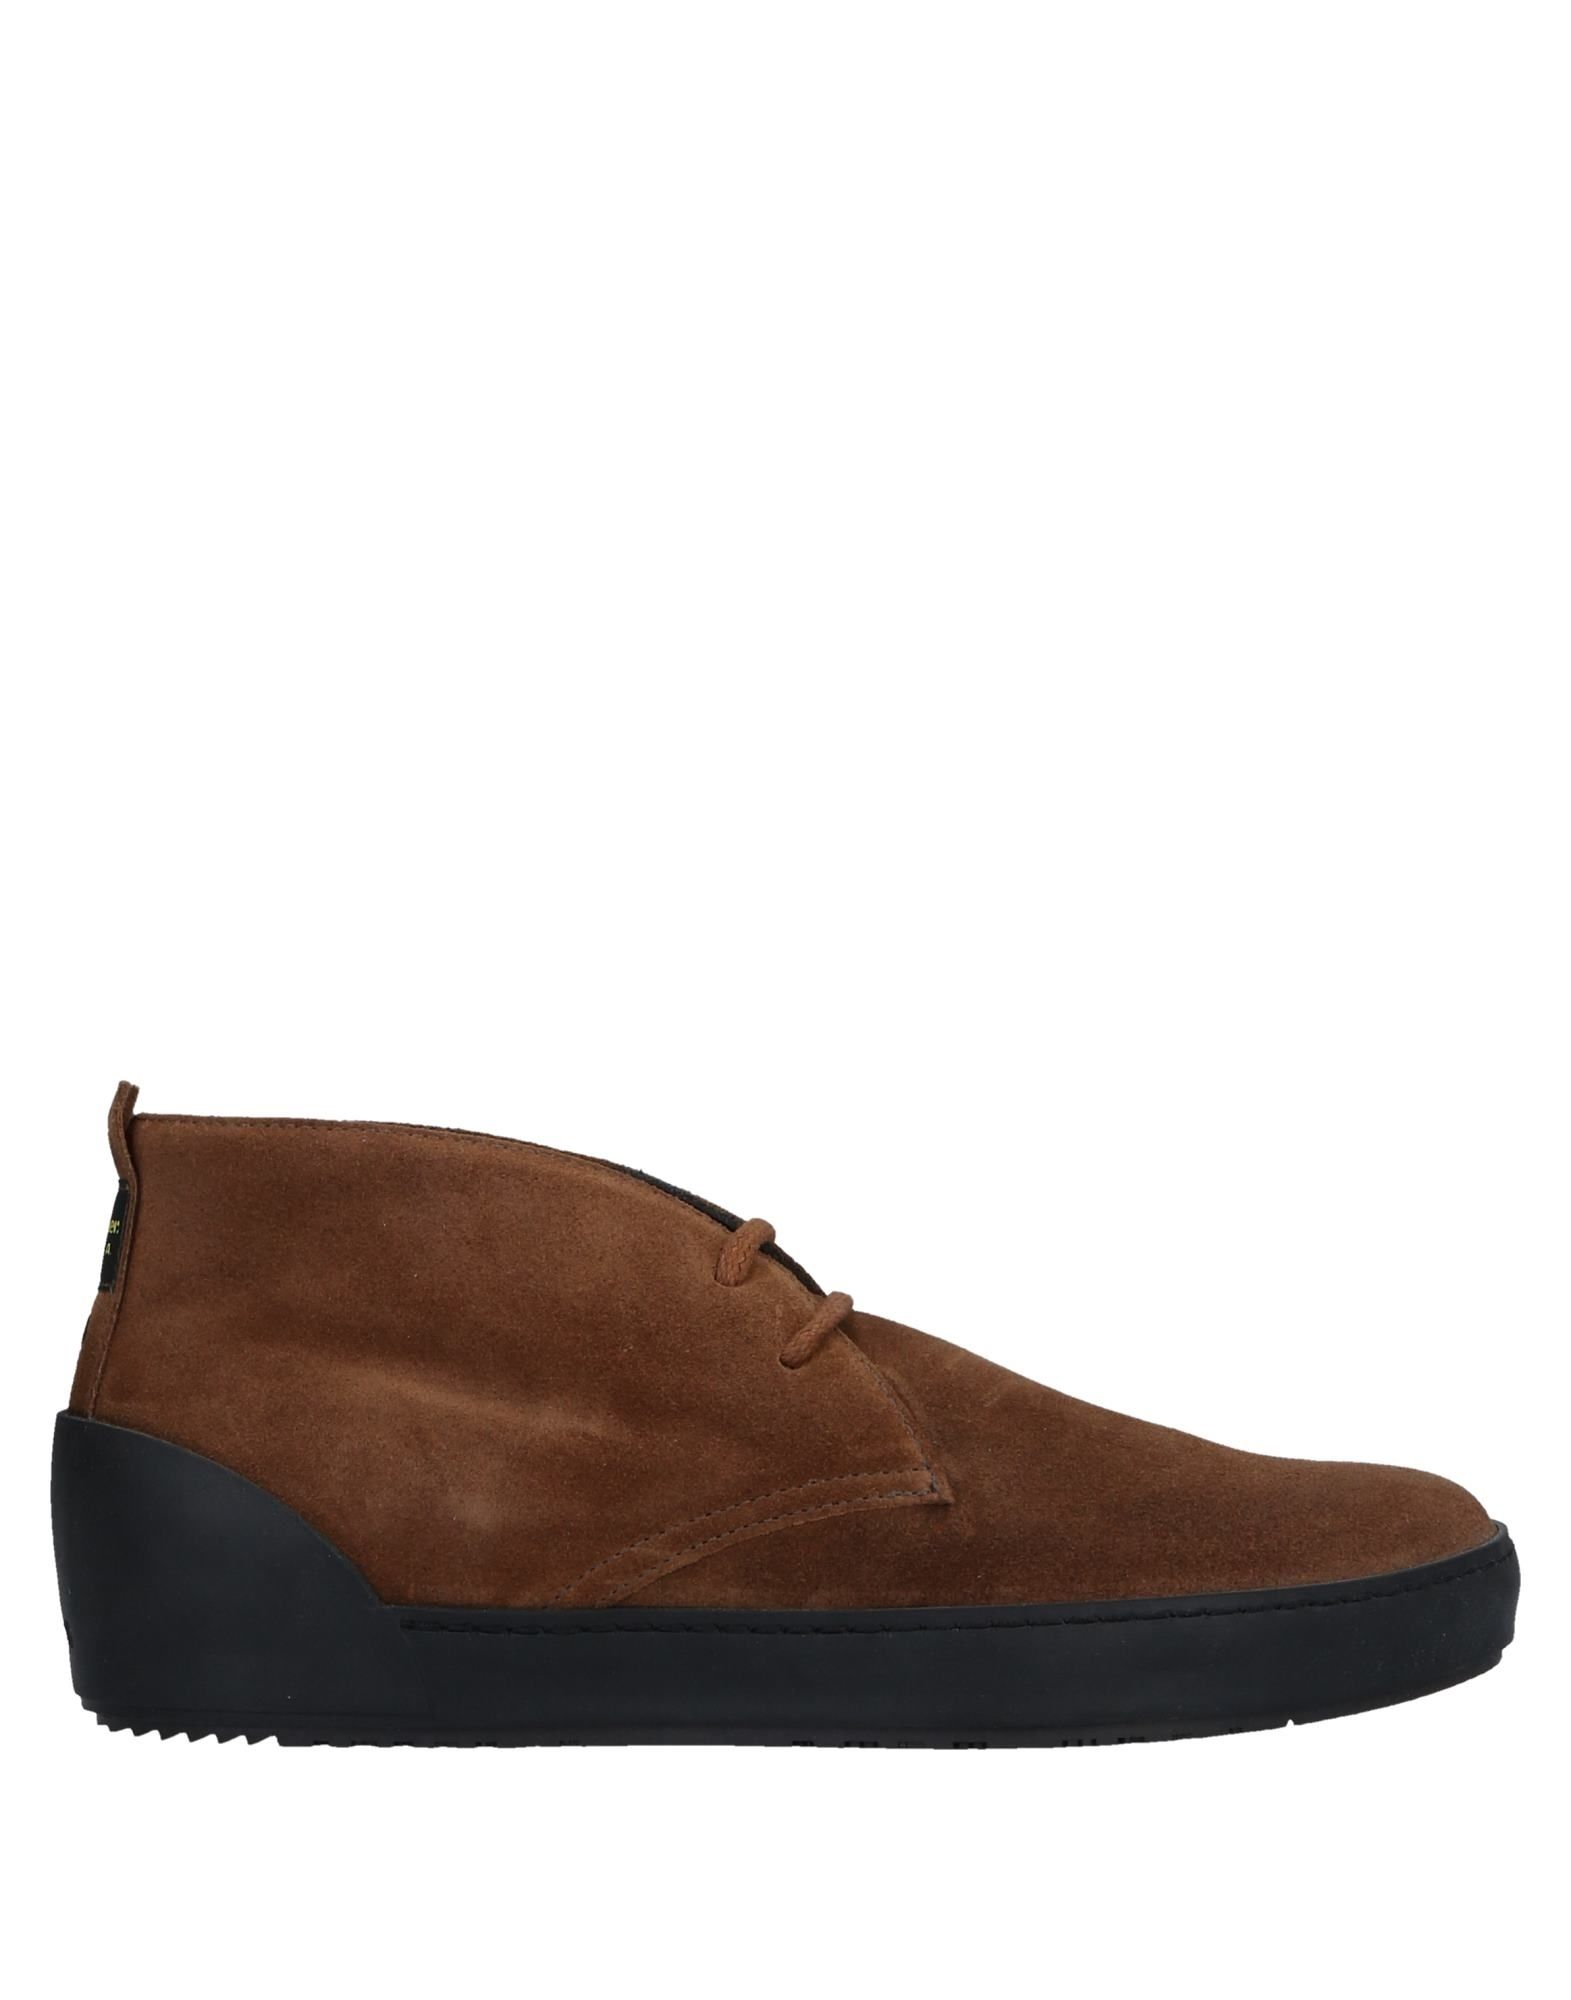 Blauer Boots - Men Blauer Boots online on 11524061VE  United Kingdom - 11524061VE on e1d53c